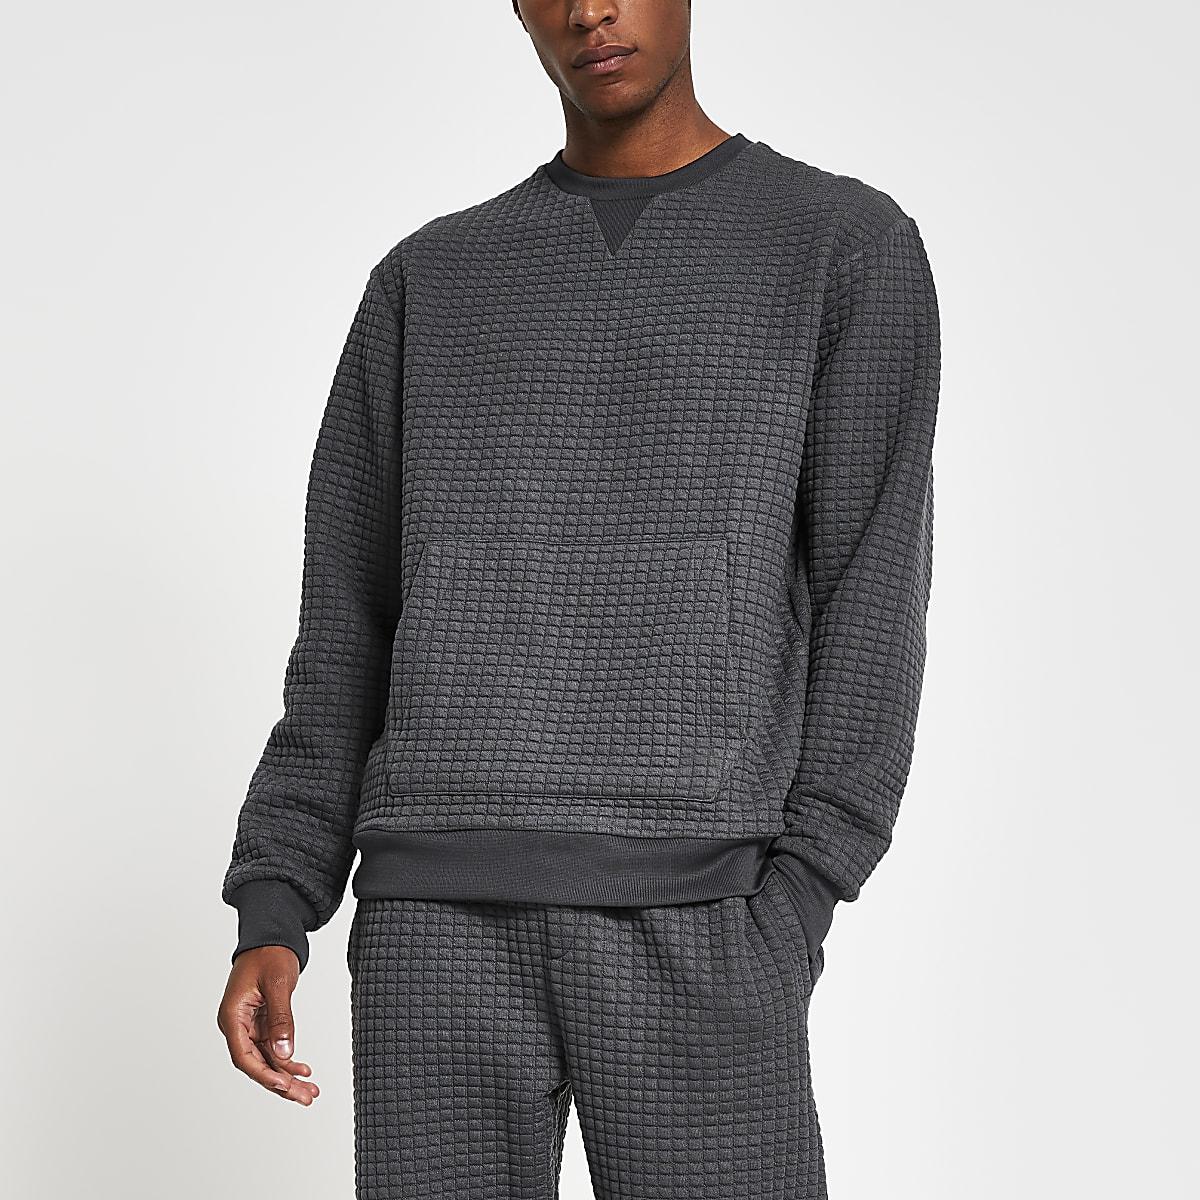 loungewear trends from River Island